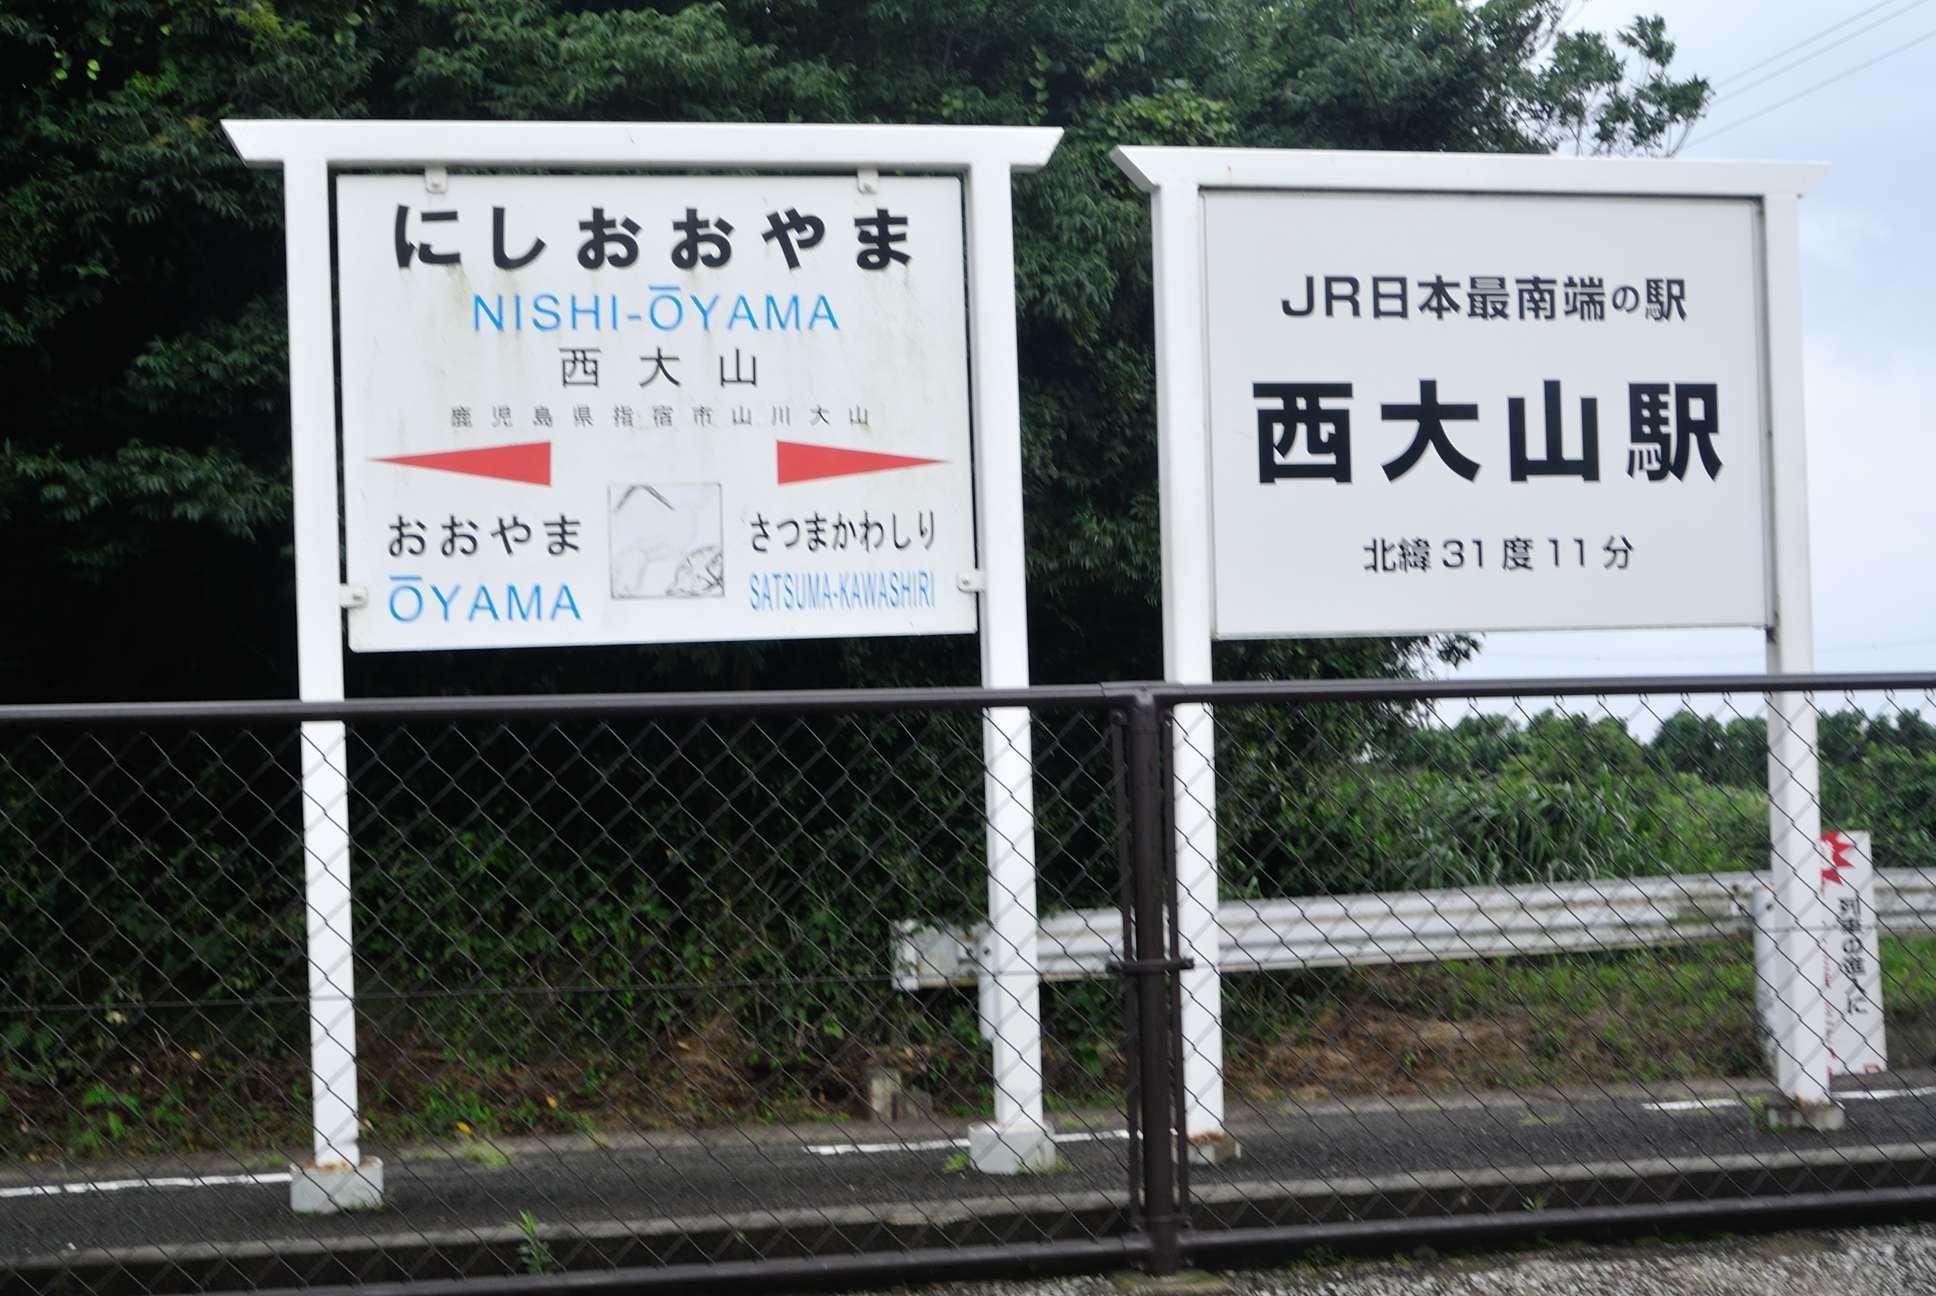 JR最南端の西大山駅